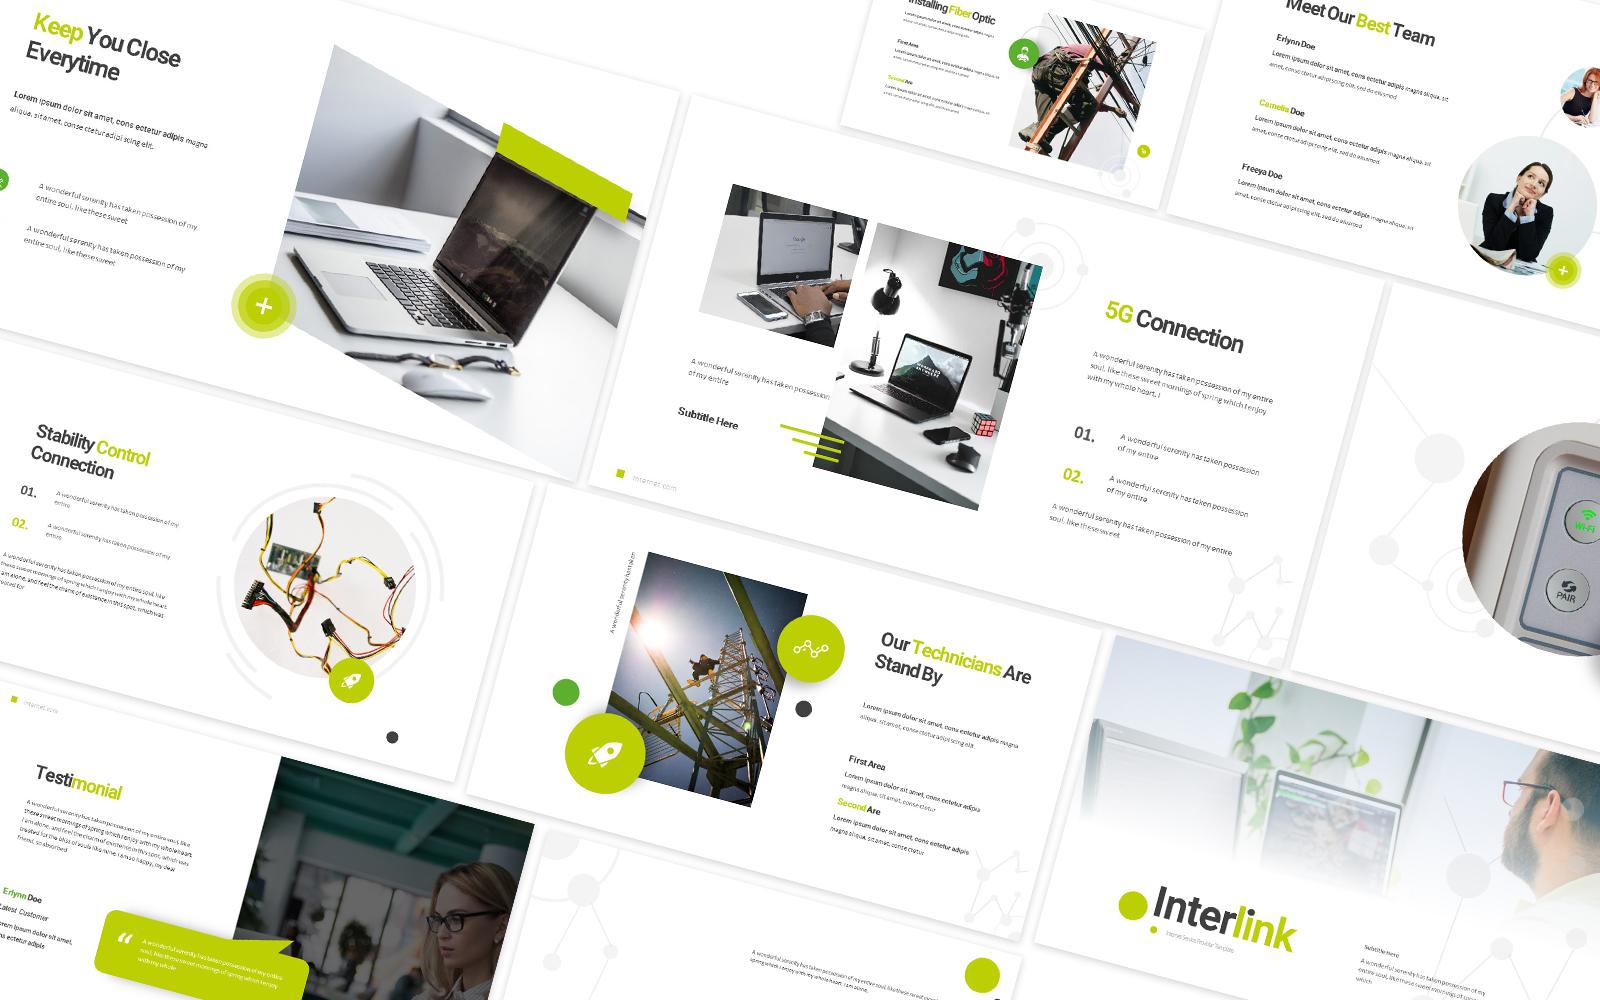 Interlink Internet Service Provider Powerpoint Template